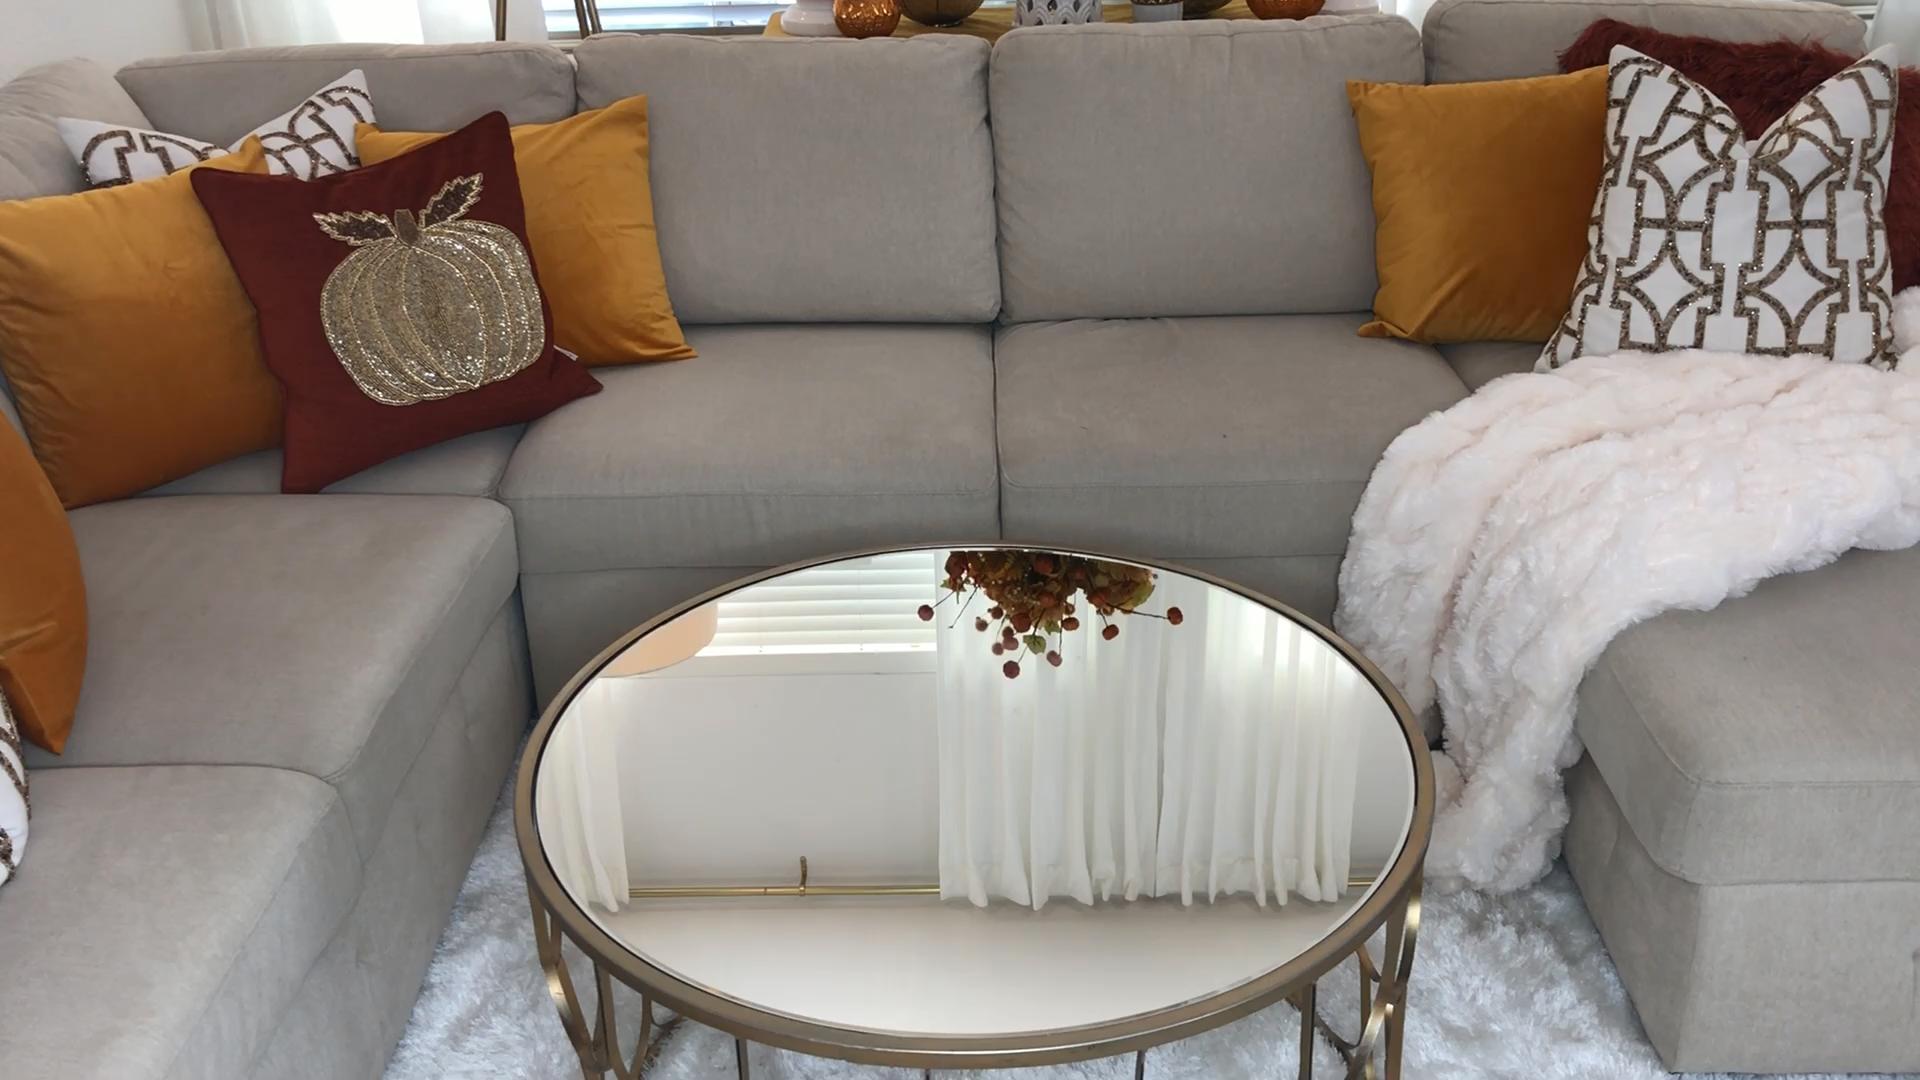 Simple Fall Table Decor And Design Ideas Fall And Autumn Decor Ideas For More Home Decor Fol Fall Home Decor Glam Coffee Table Decor Table Decor Living Room